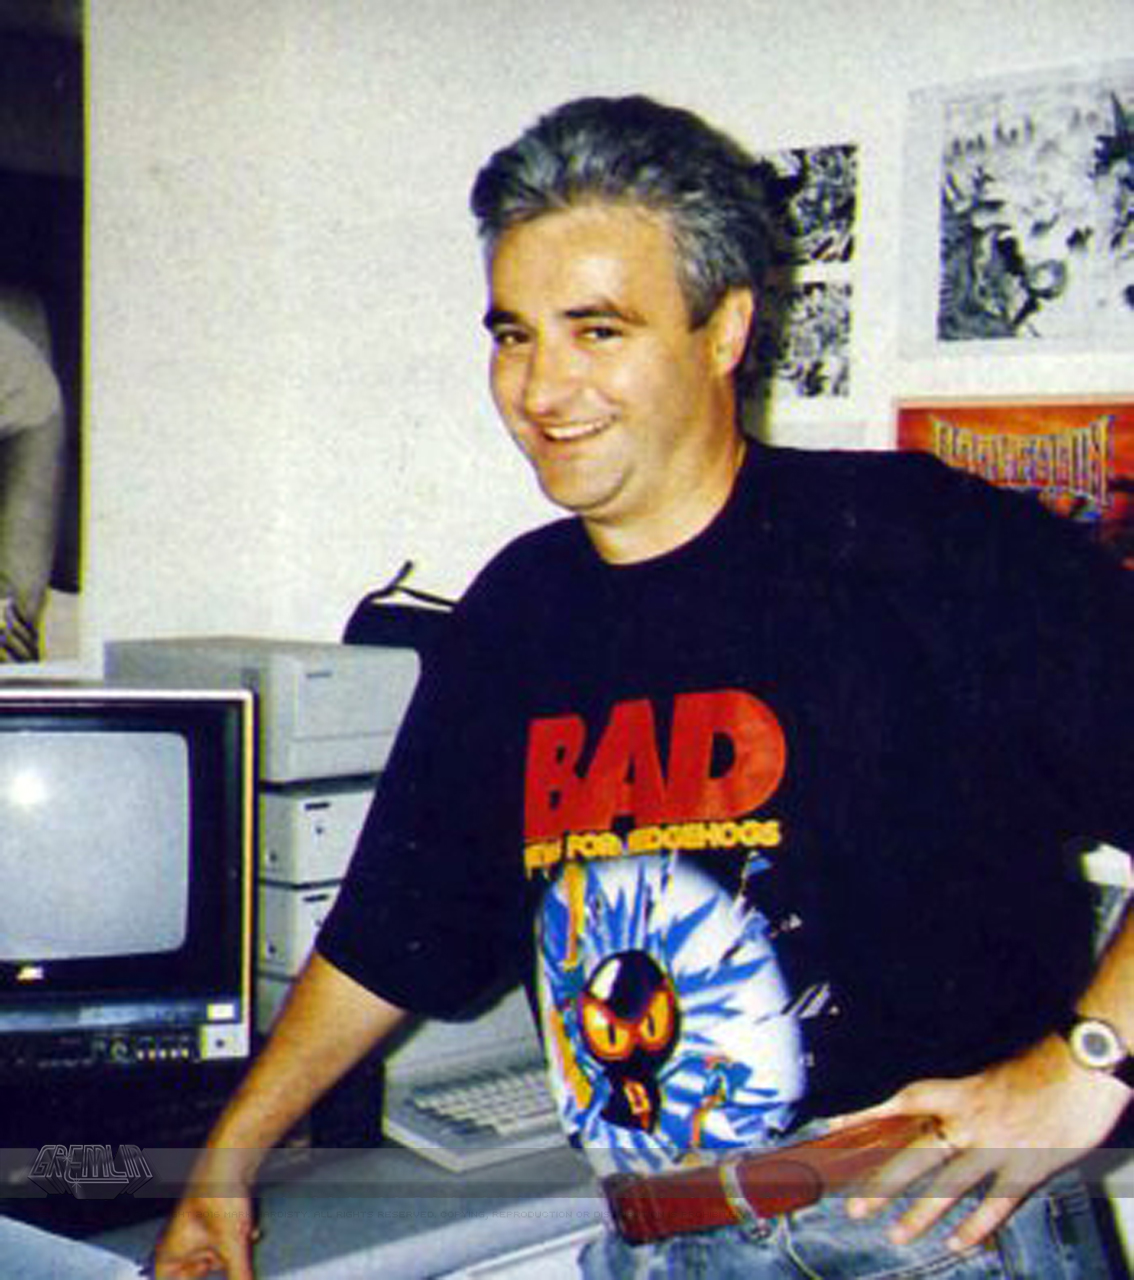 Ian Stewart – Bad News for Hedgehogs